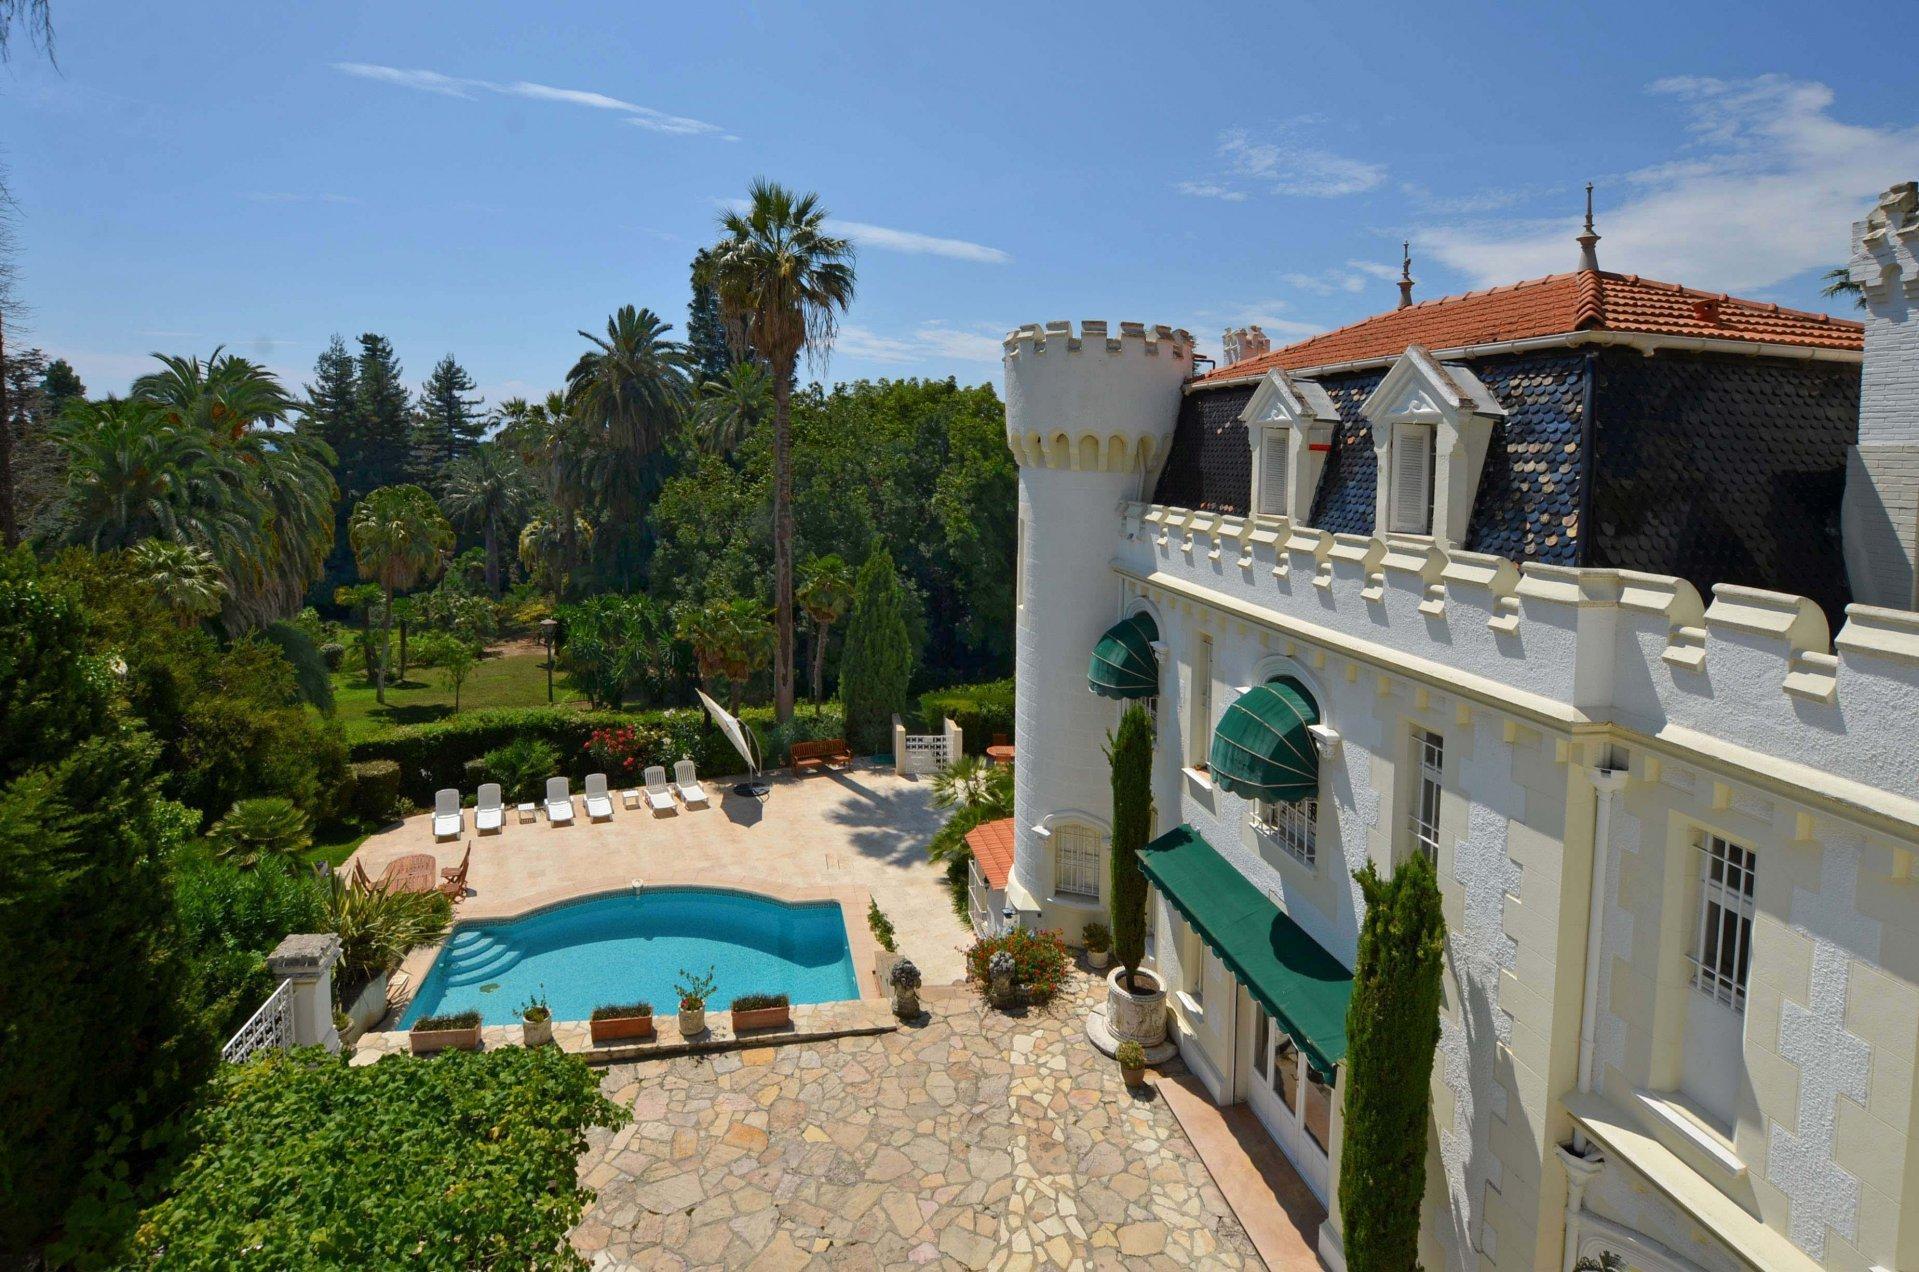 Cannes - Little chateau